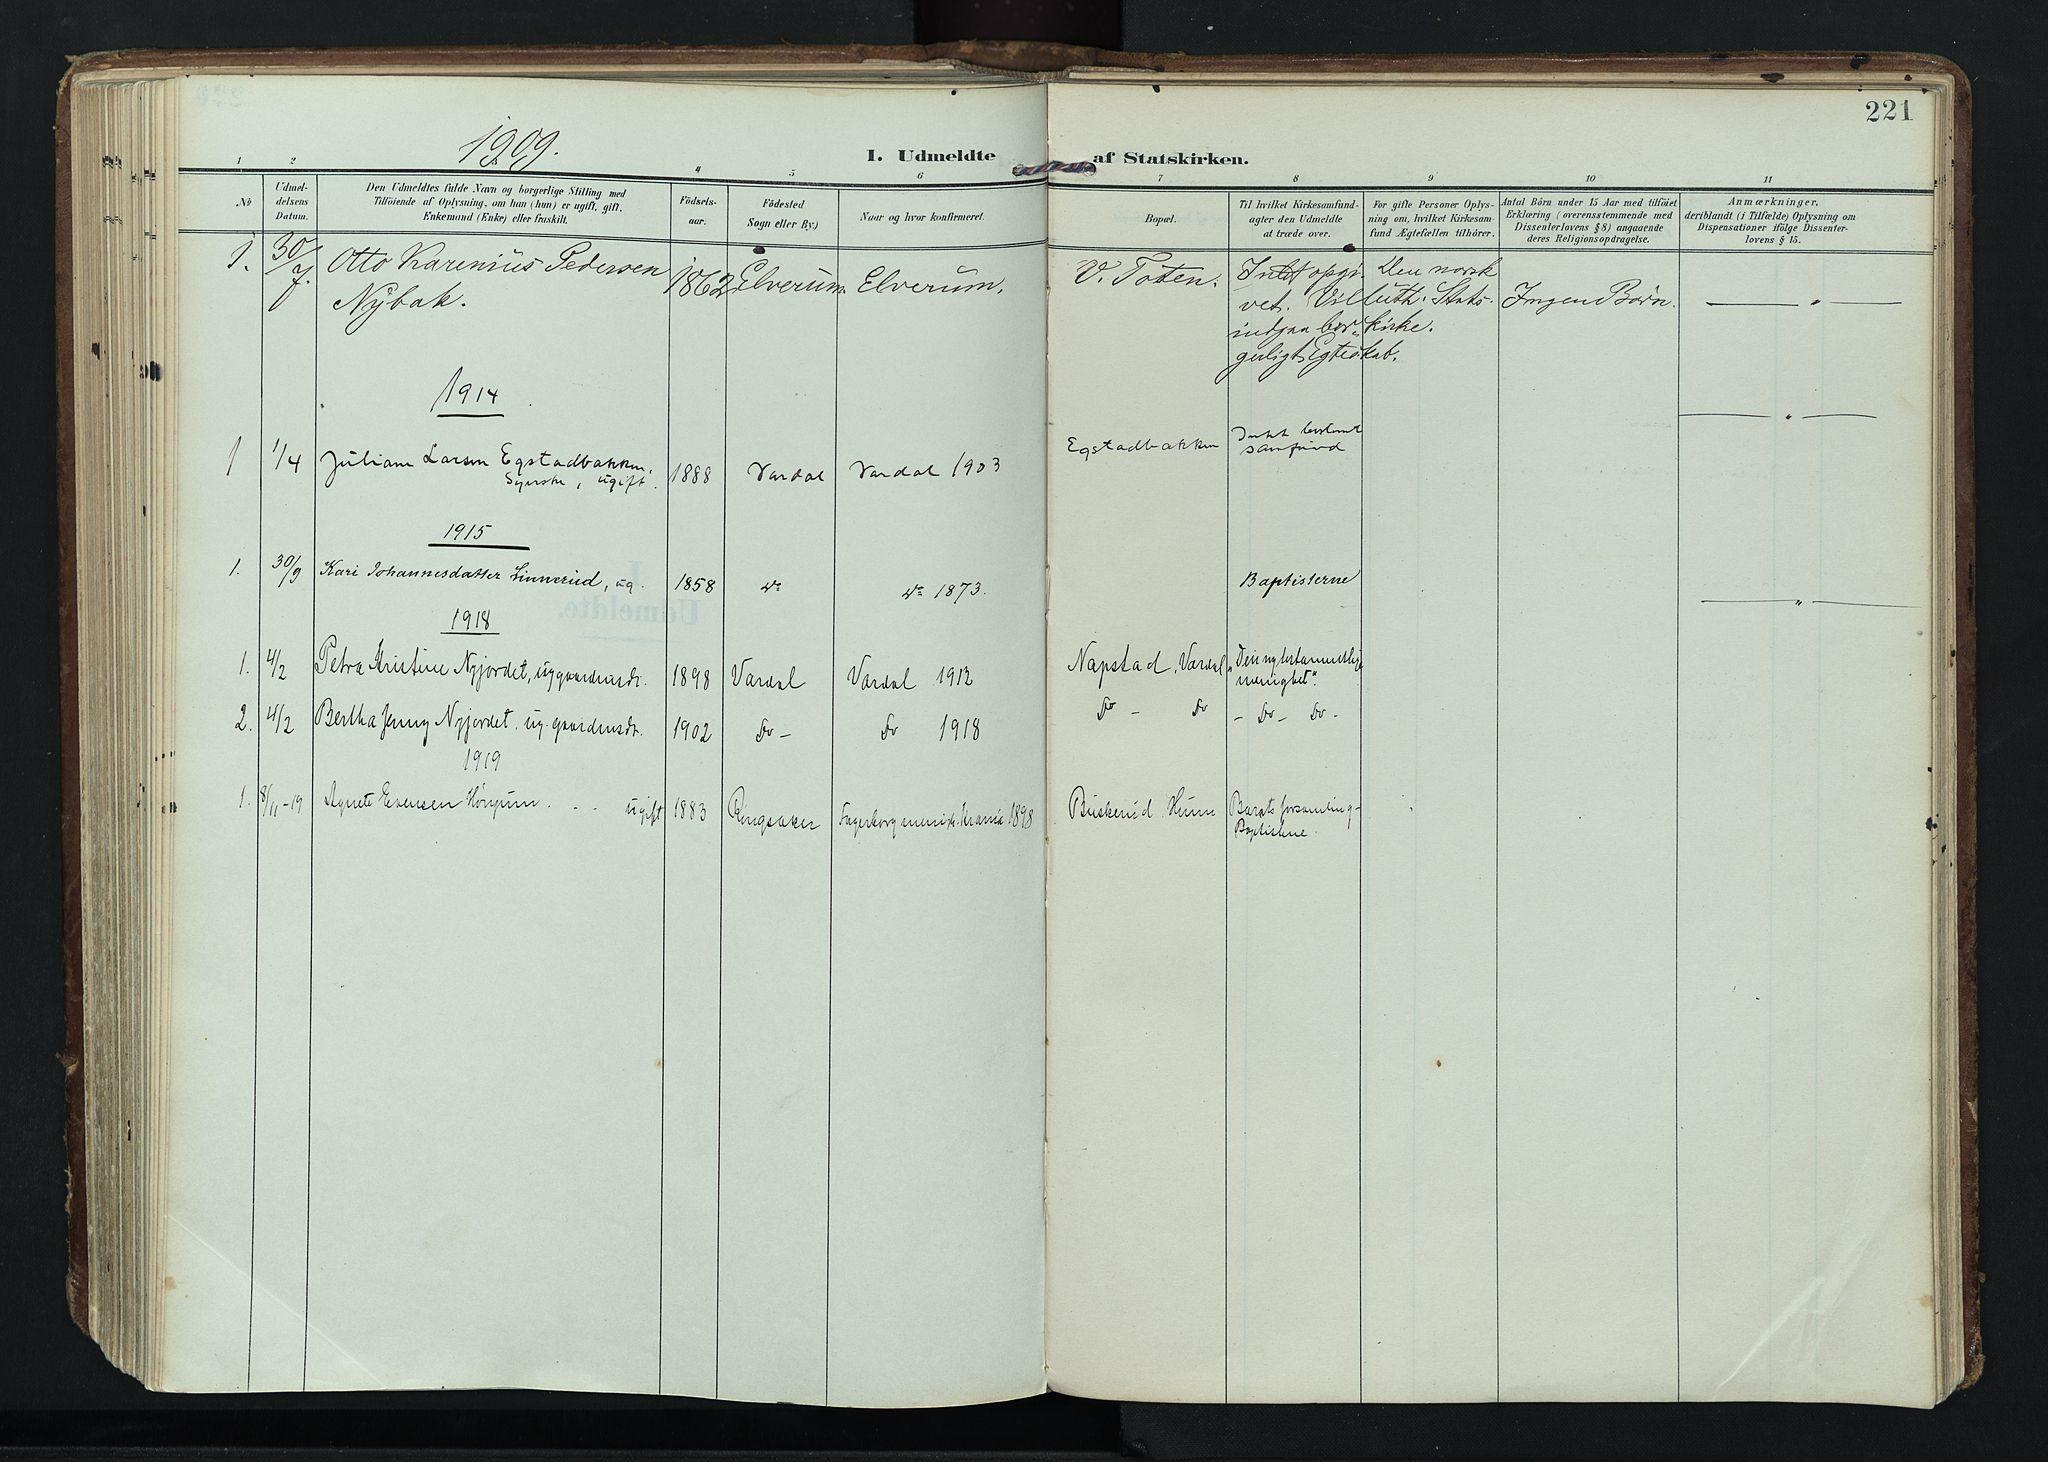 SAH, Vardal prestekontor, H/Ha/Haa/L0020: Ministerialbok nr. 20, 1907-1921, s. 221